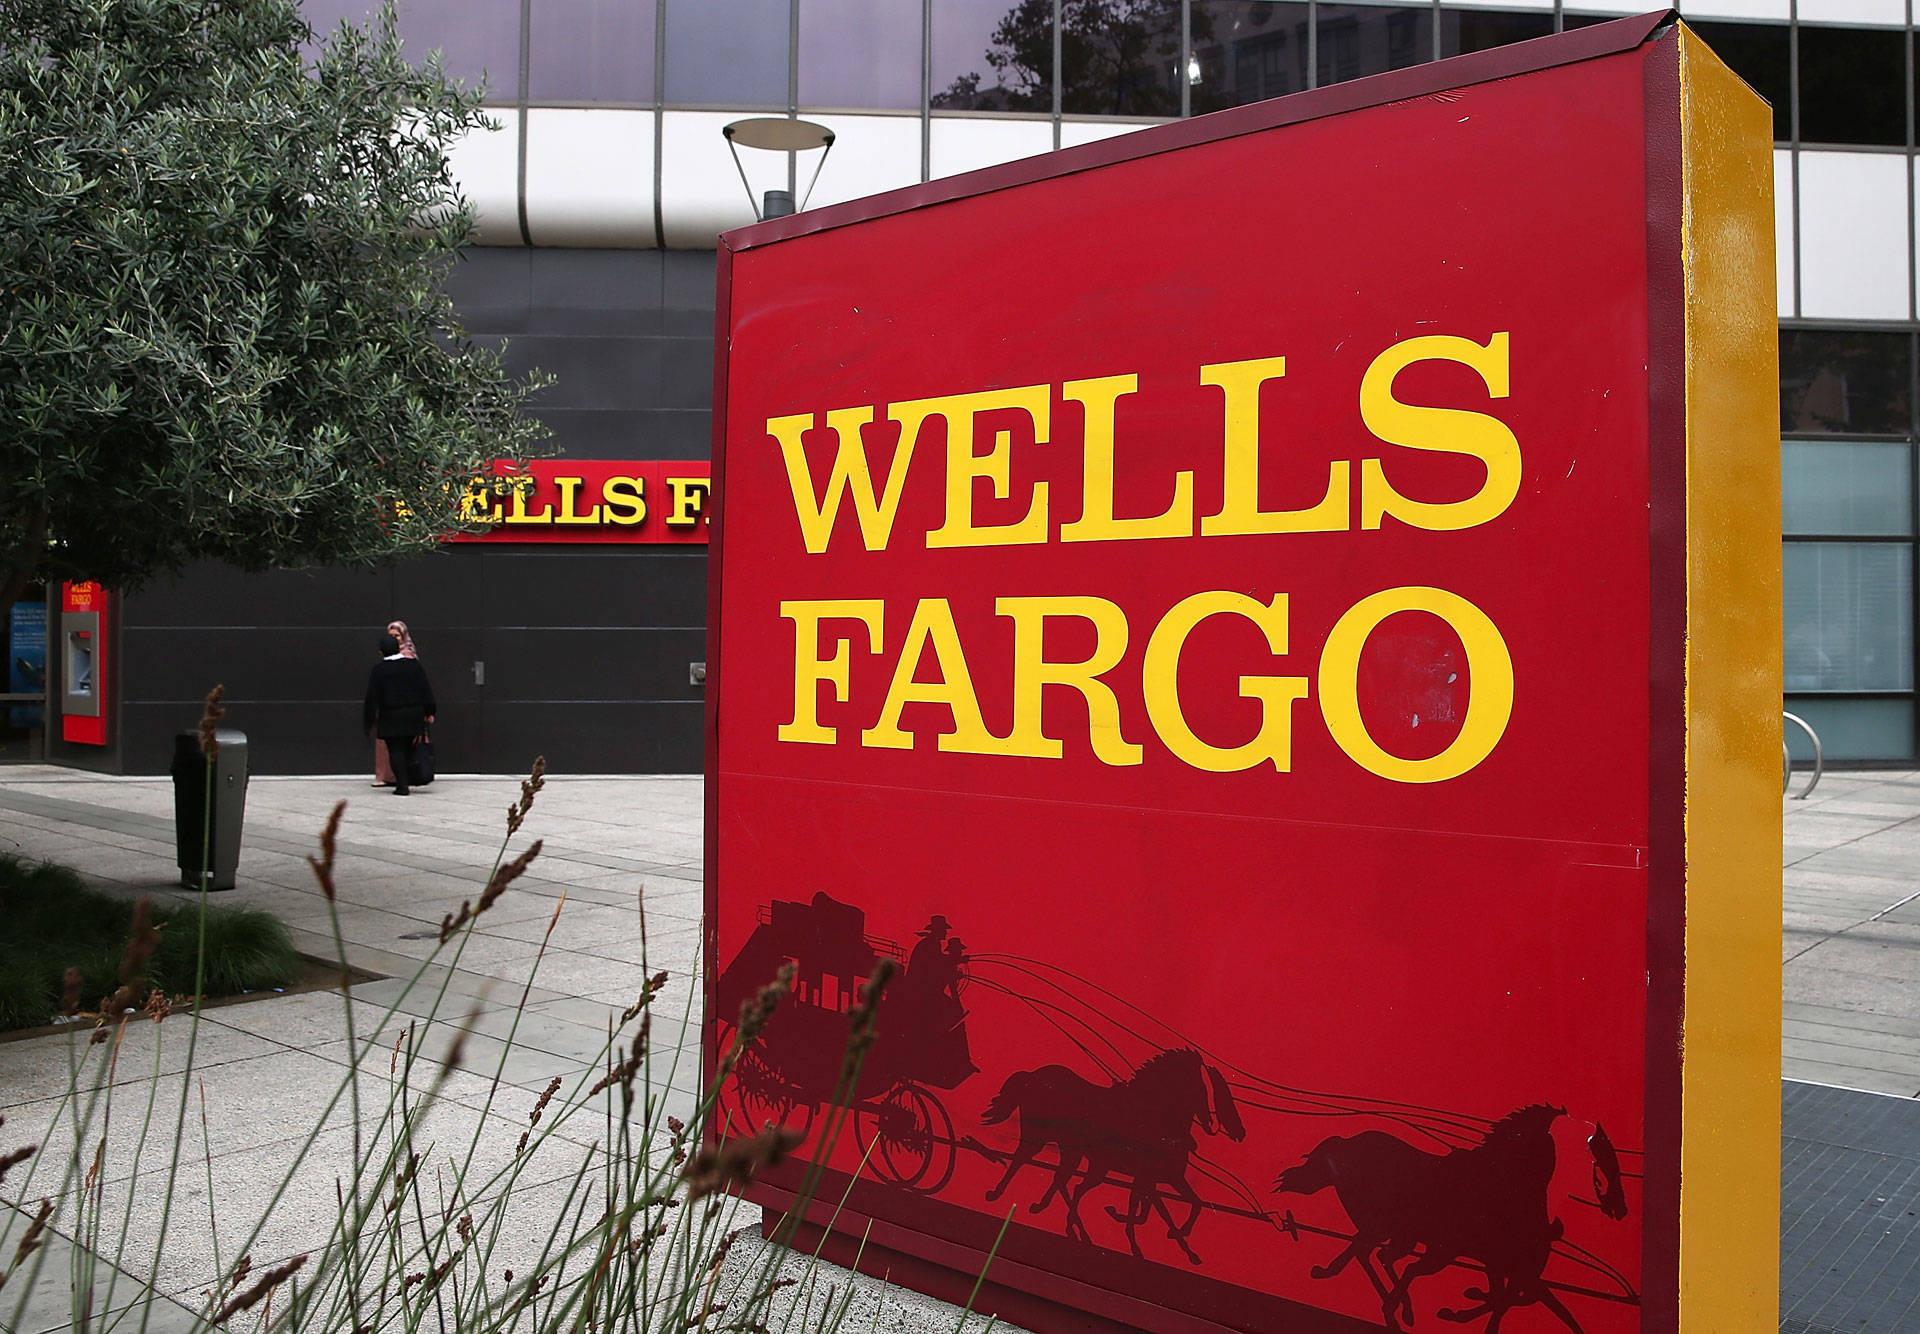 Investigation of Wells Fargo Sales Practices Details 'Dramatic Failure'